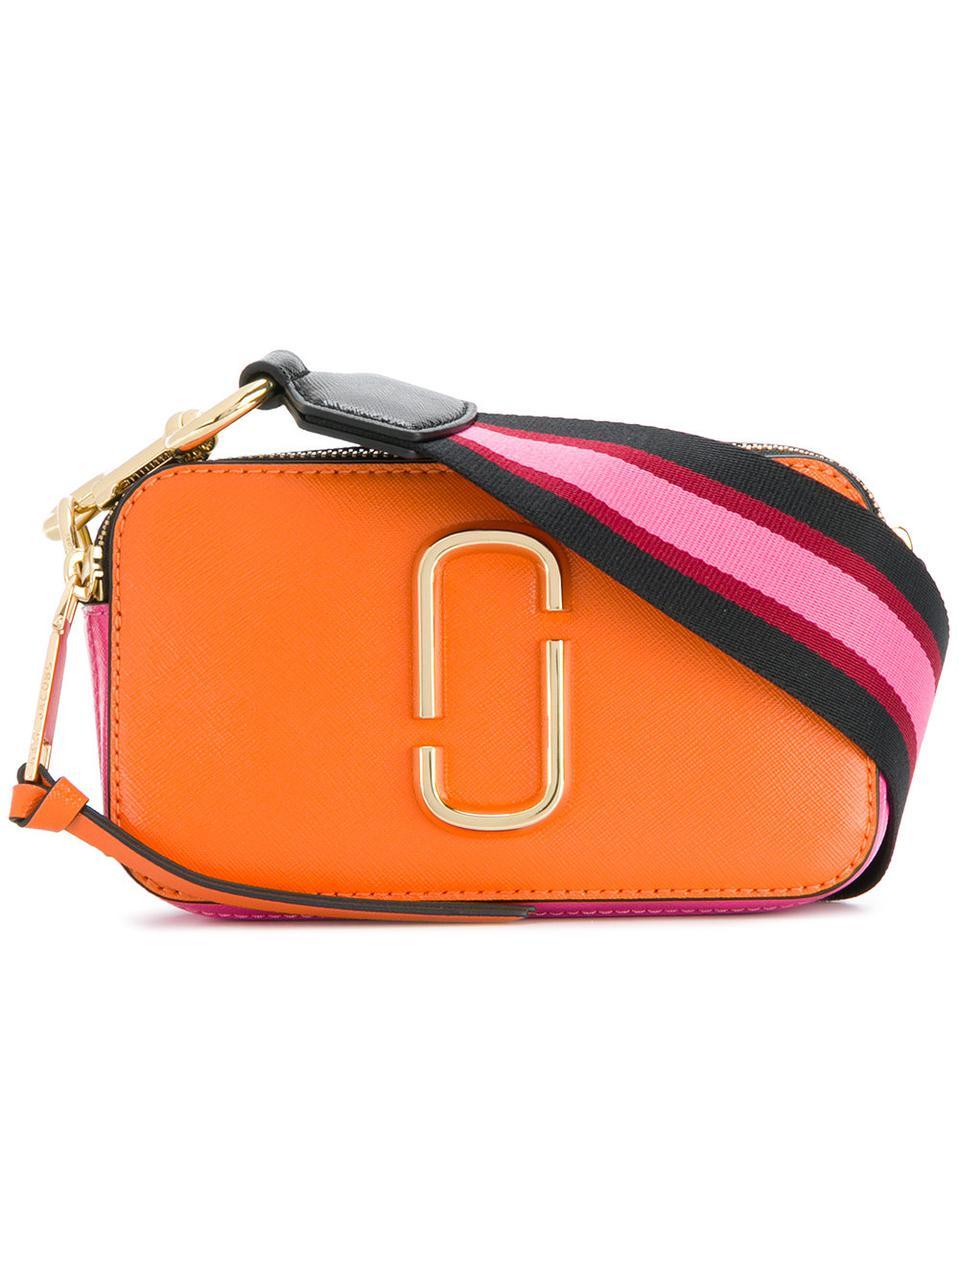 01889f824f0a MARC JACOBS маленькая сумка Snapshot Camera, цена 2 599 грн., купить ...